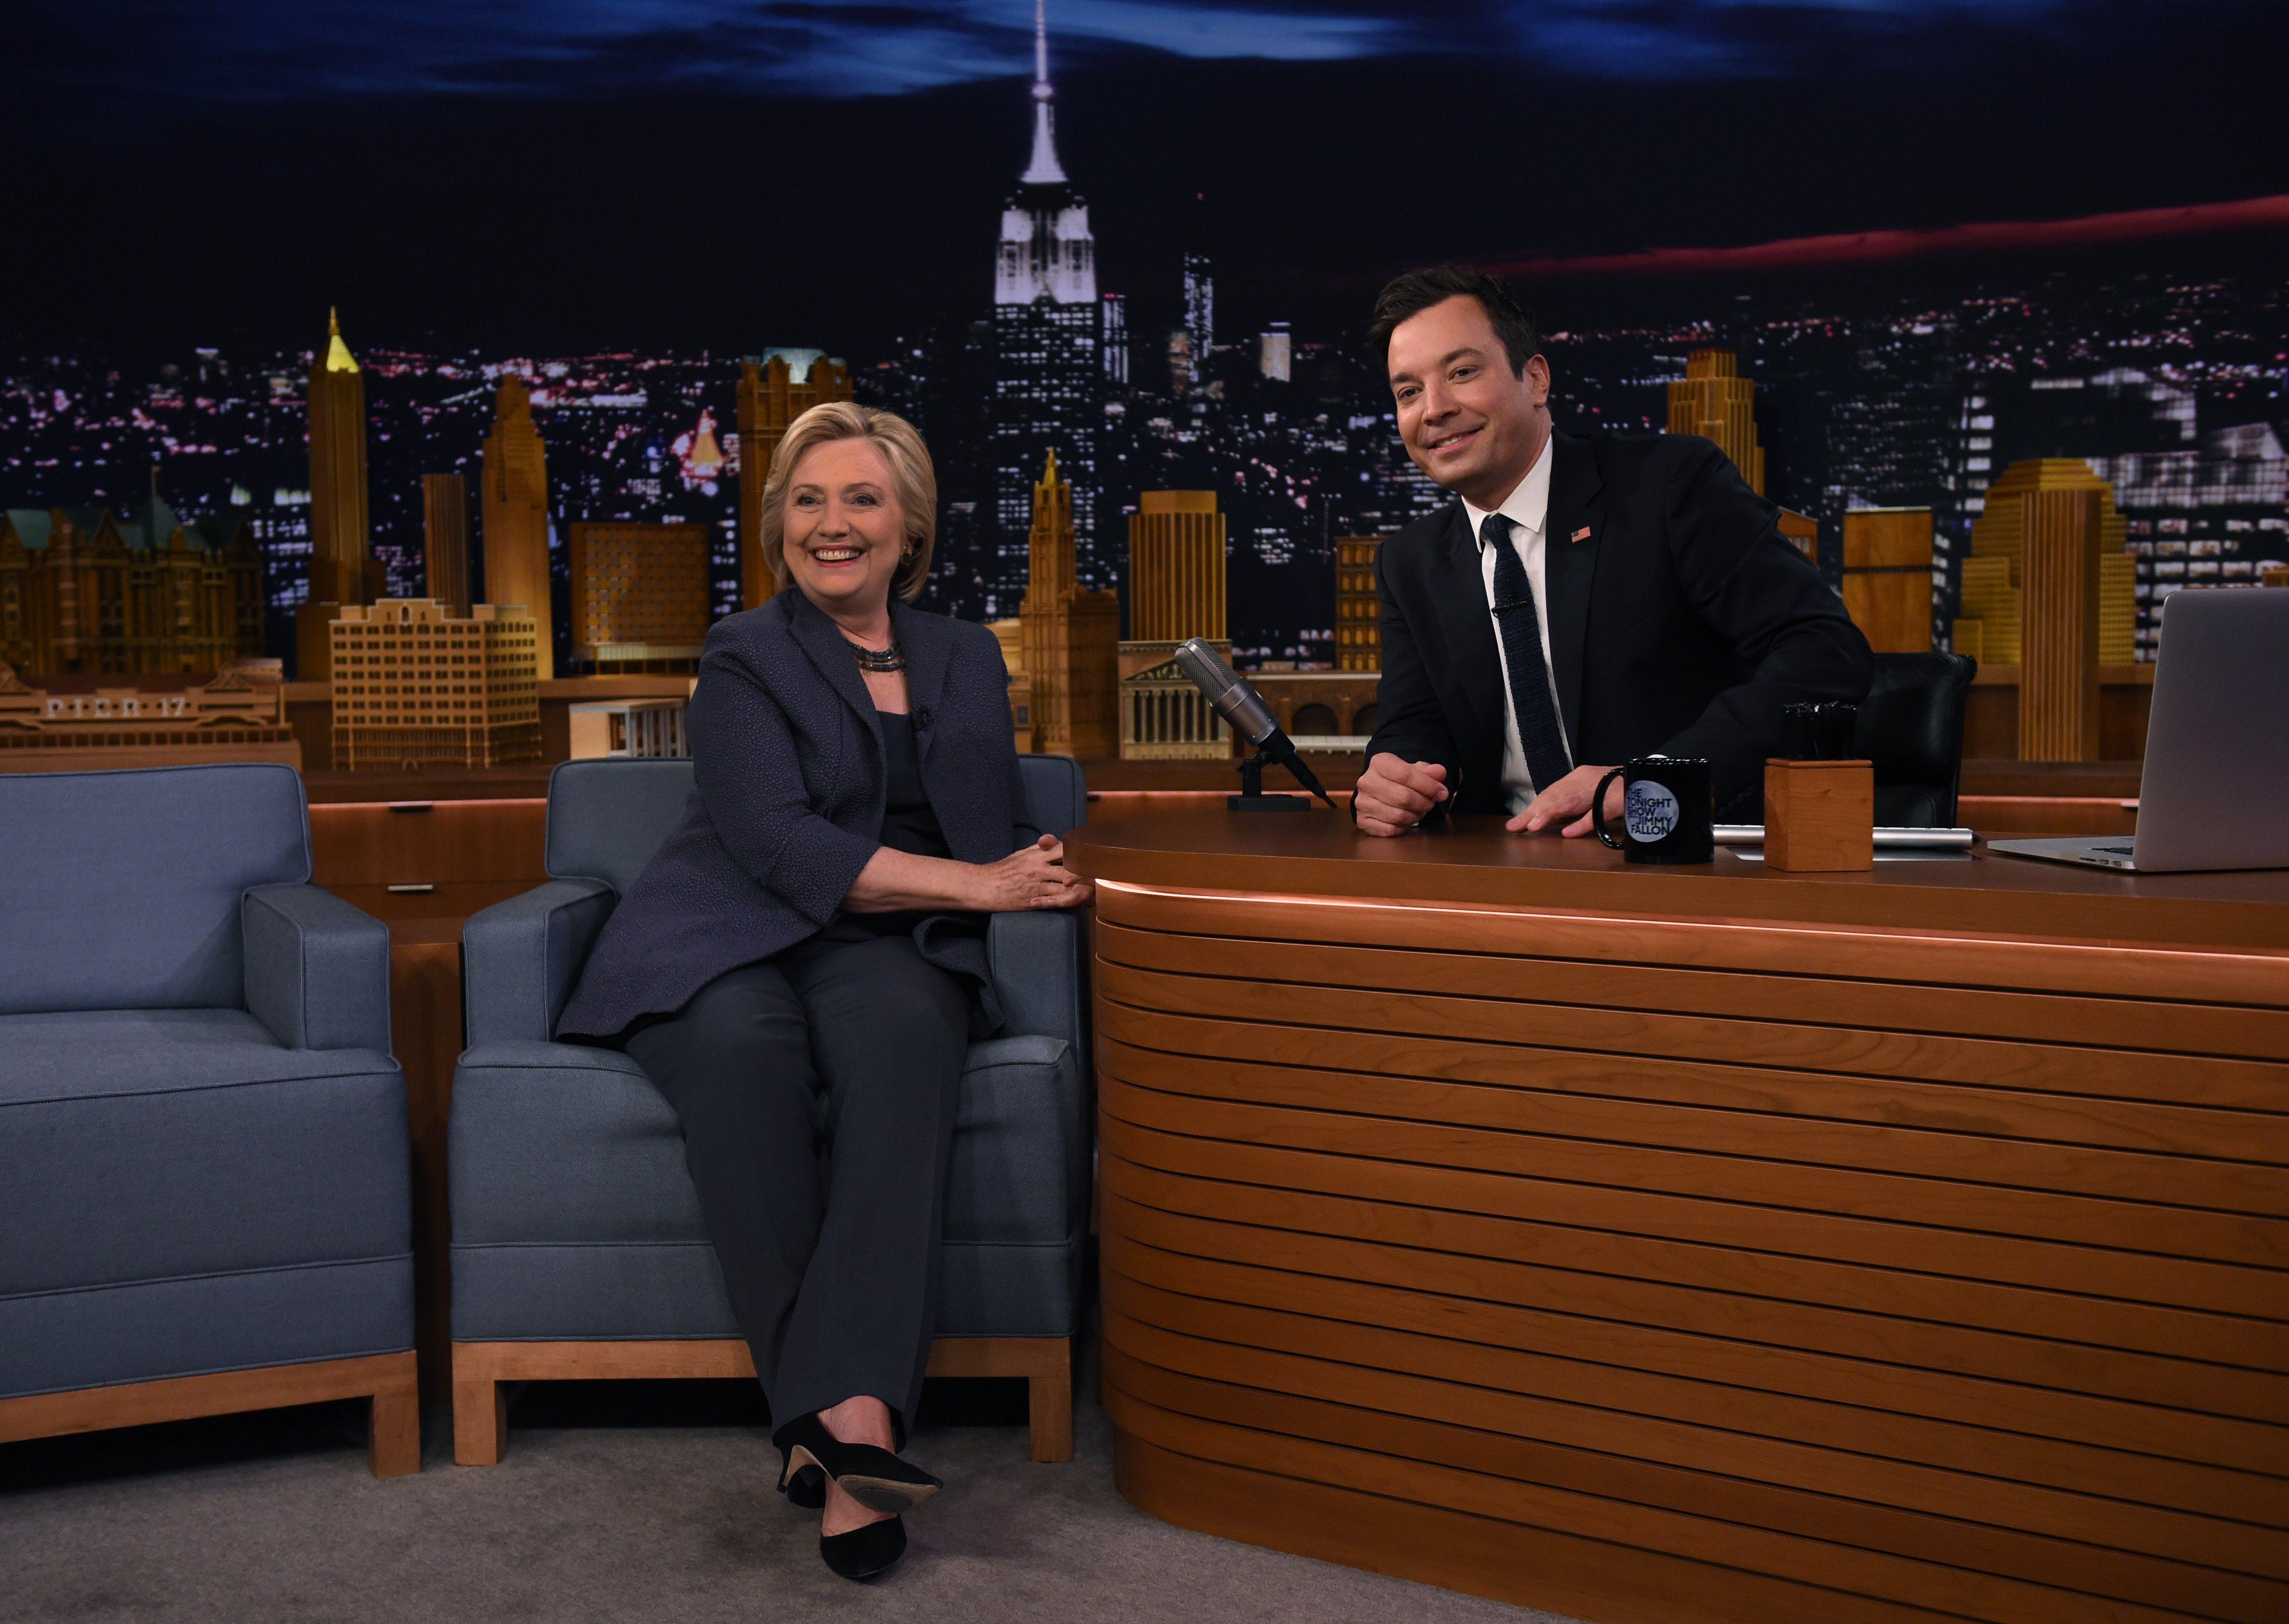 En medio de rumores de enfermedad, Jimmy Fallon recibió a Hillary Clinton con barbijo